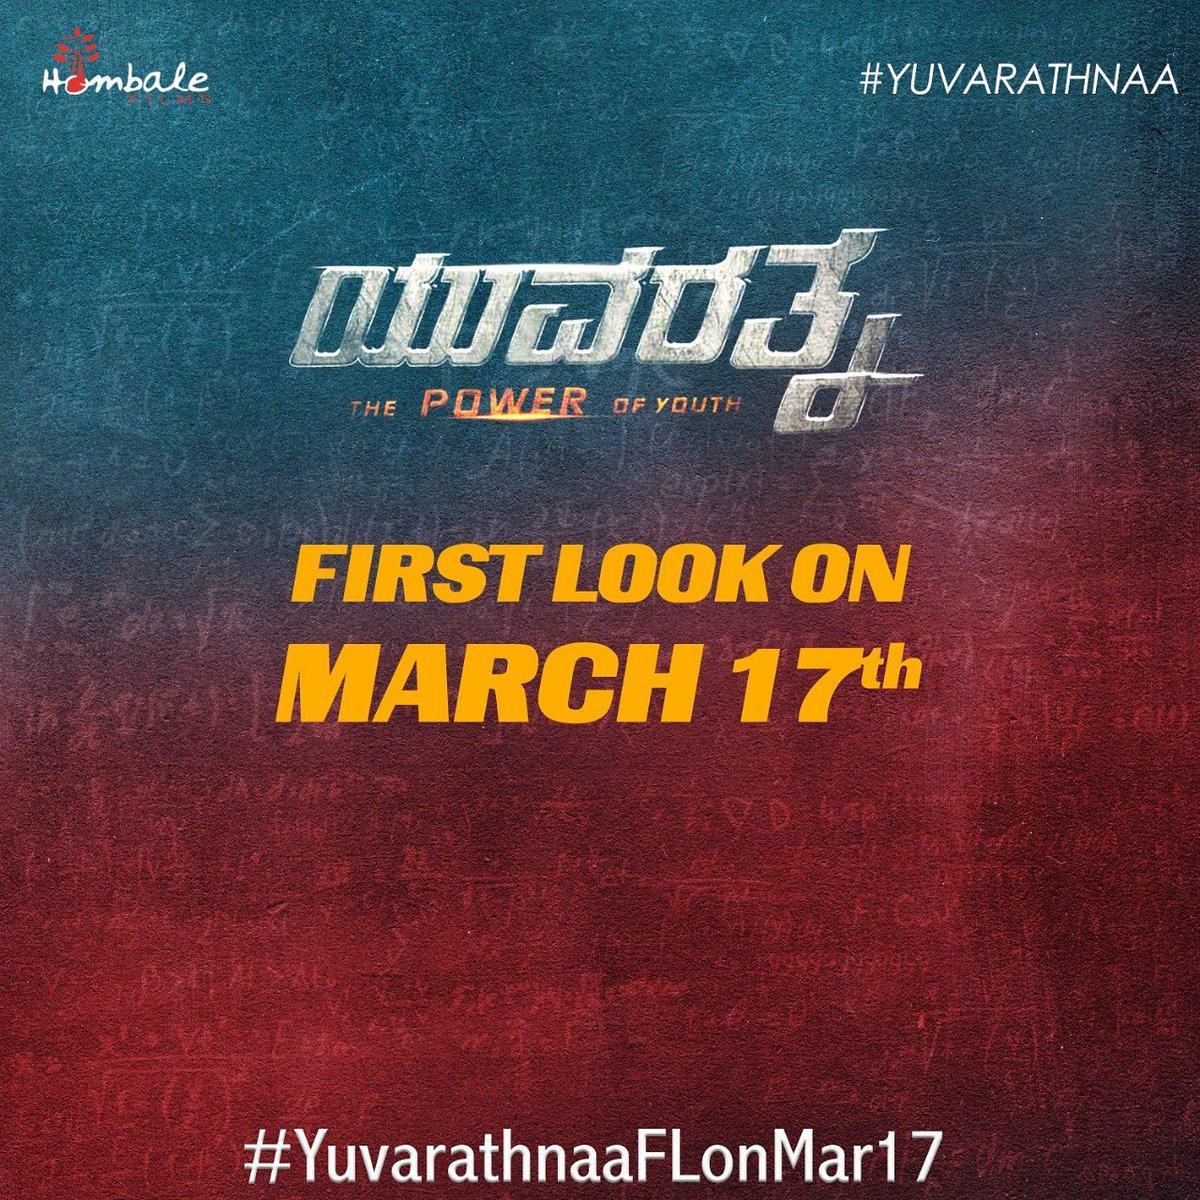 #yuvarathnaa first look on March 17th 👍